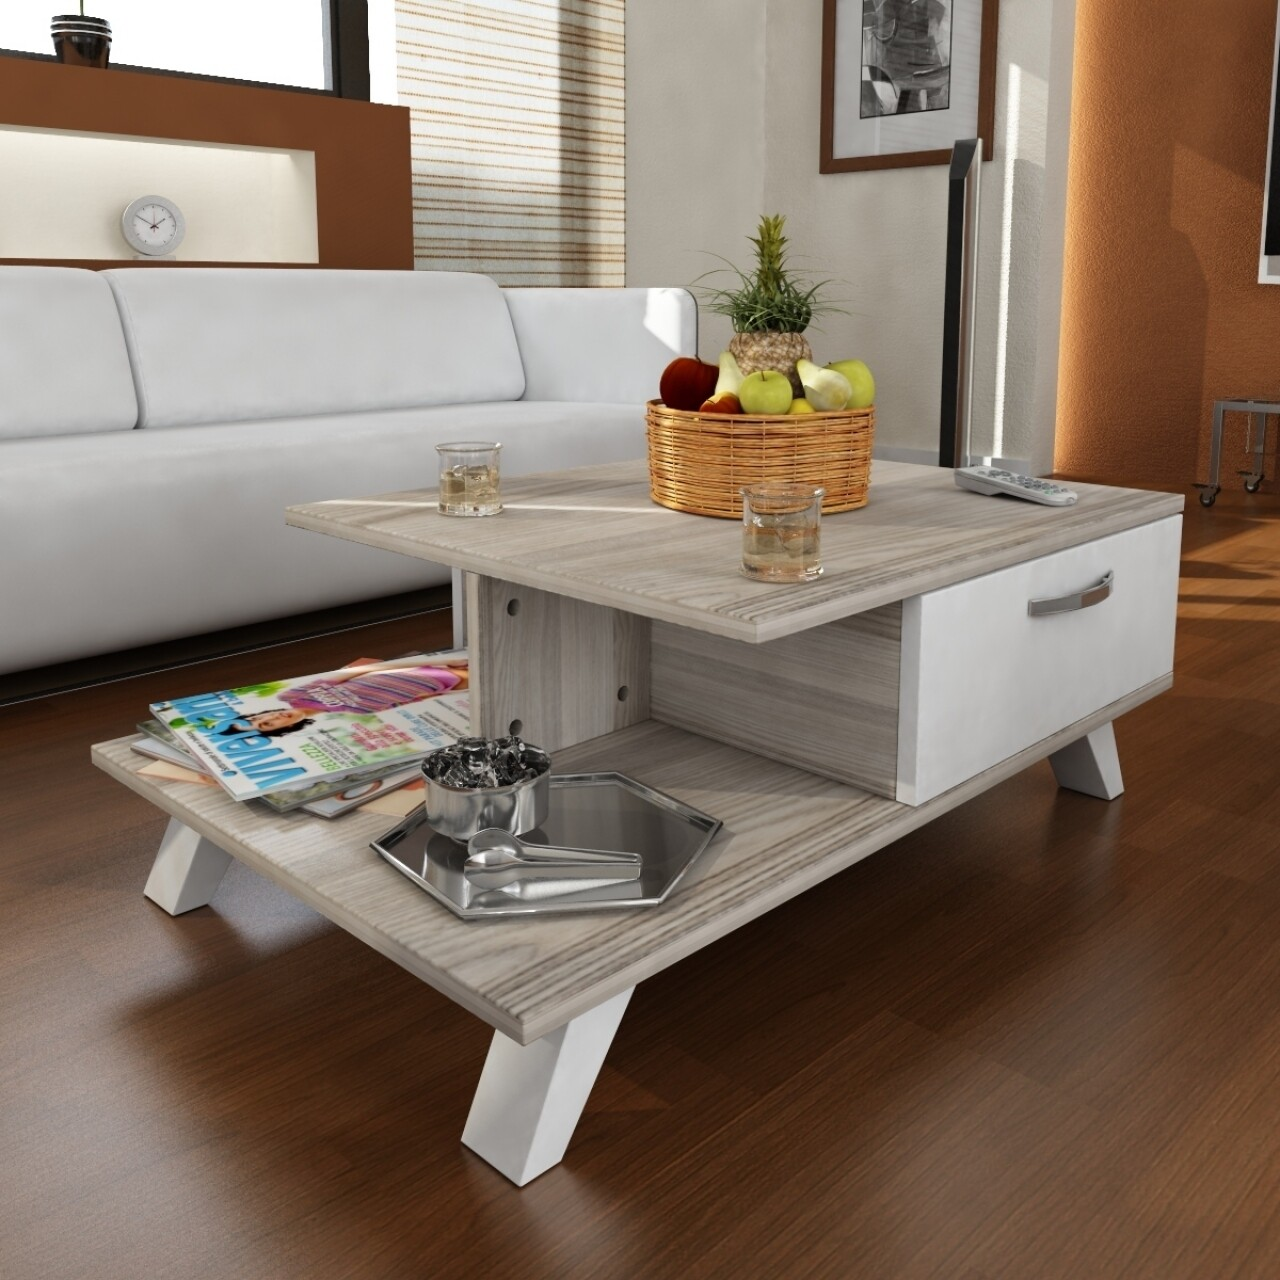 Masuta pentru living, Wooden Art, Arsenal White Cordoba, 90x33x60 cm